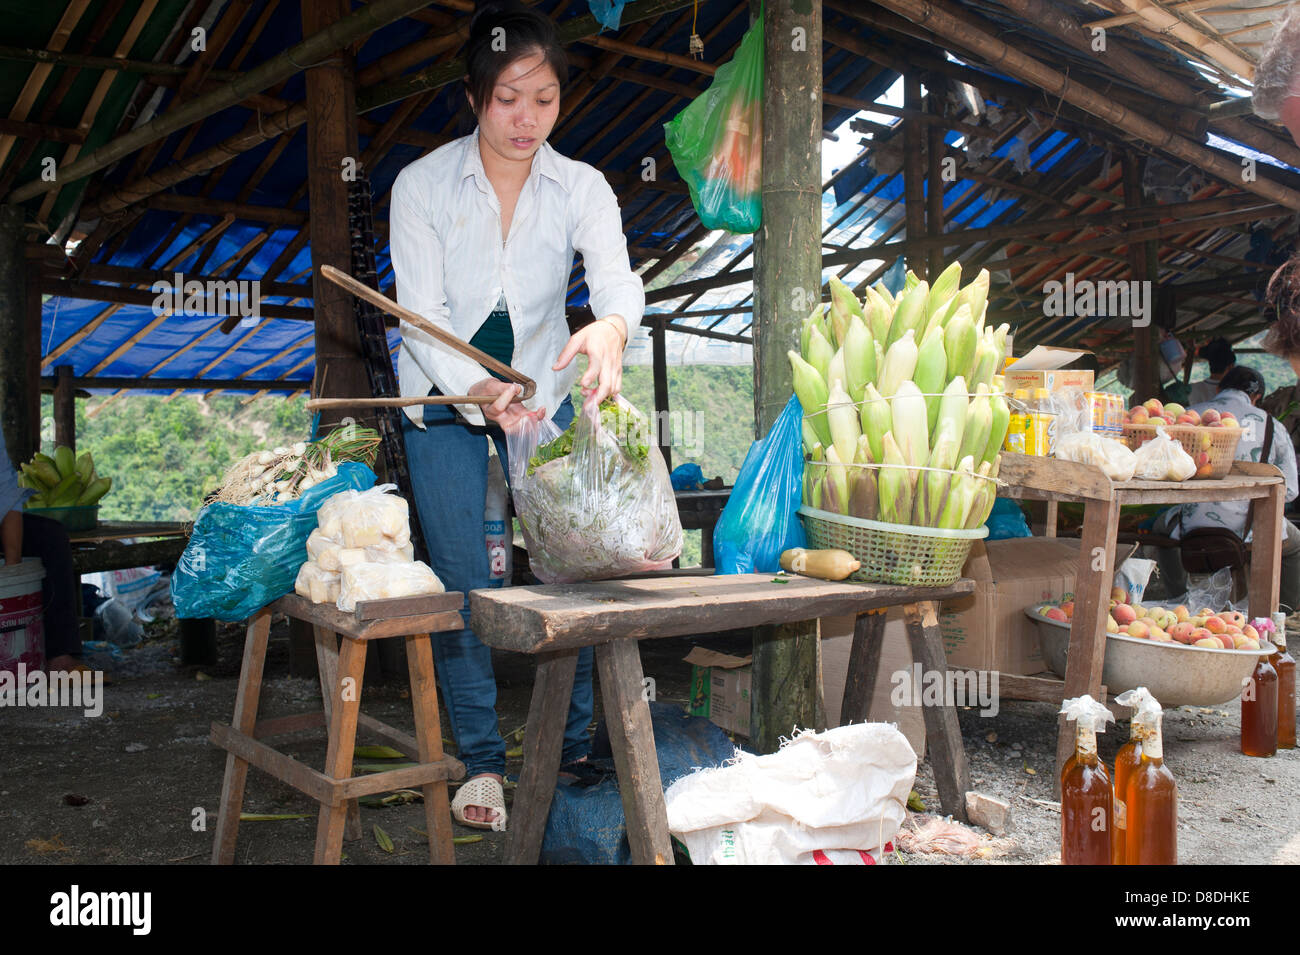 North Vietnam, street food market - Stock Image